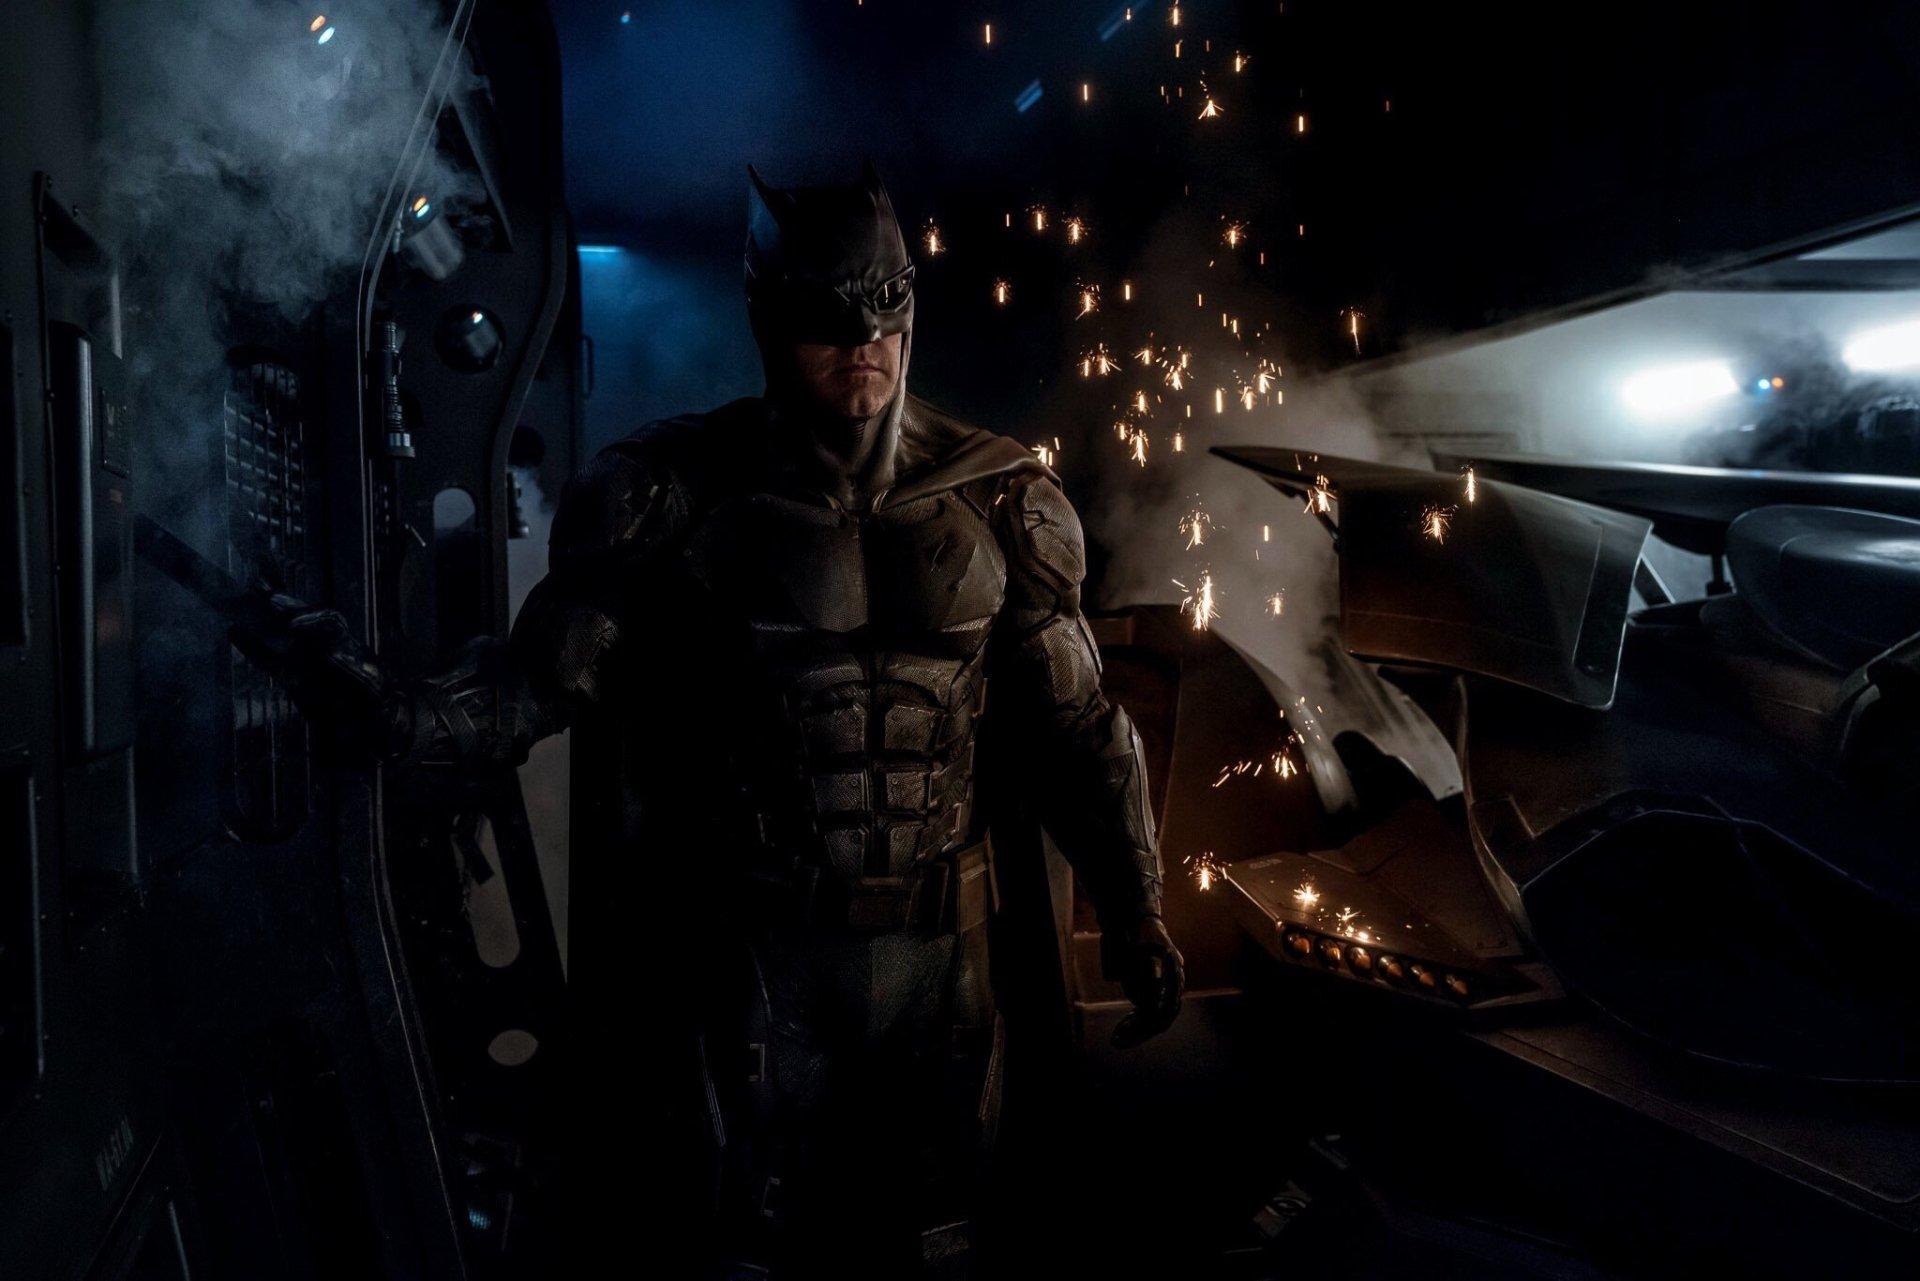 Movie - Justice League (2017)  Justice League Ben Affleck Batman DC Comics Bruce Wayne Wallpaper